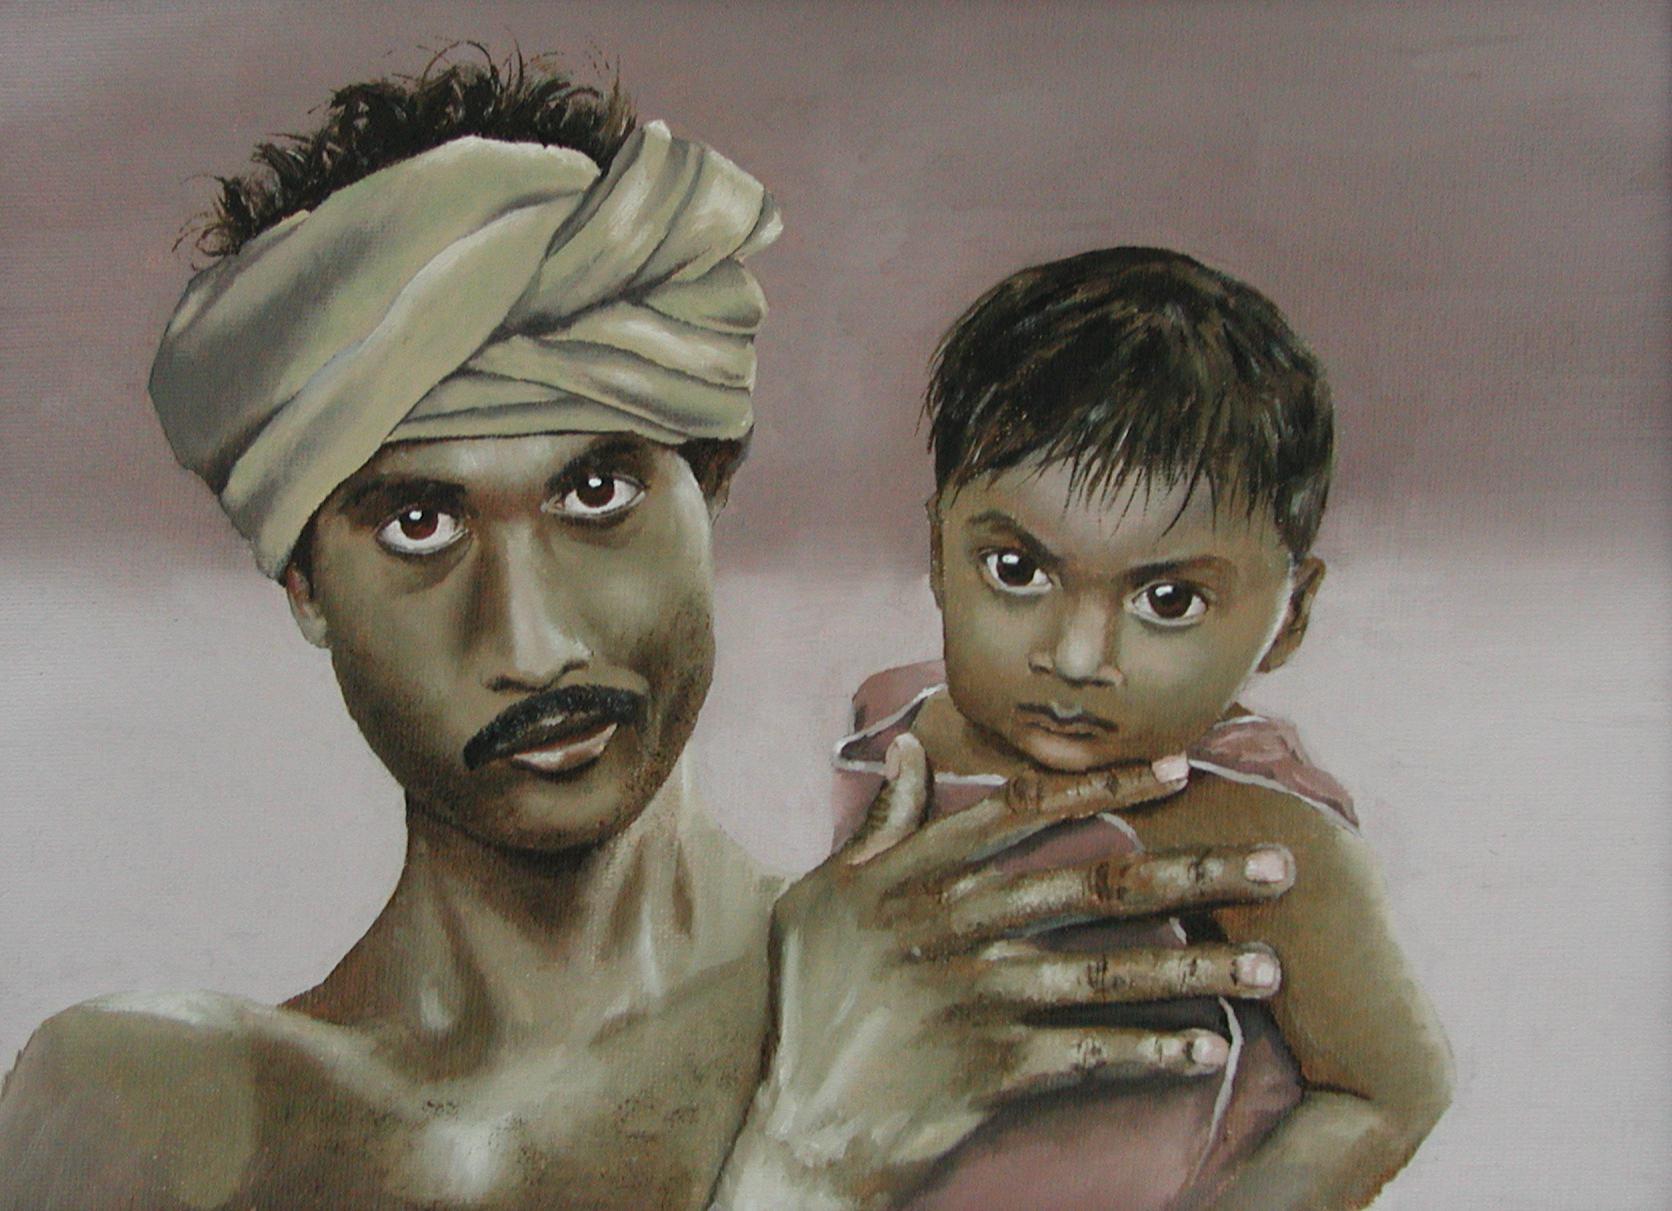 The Dalit